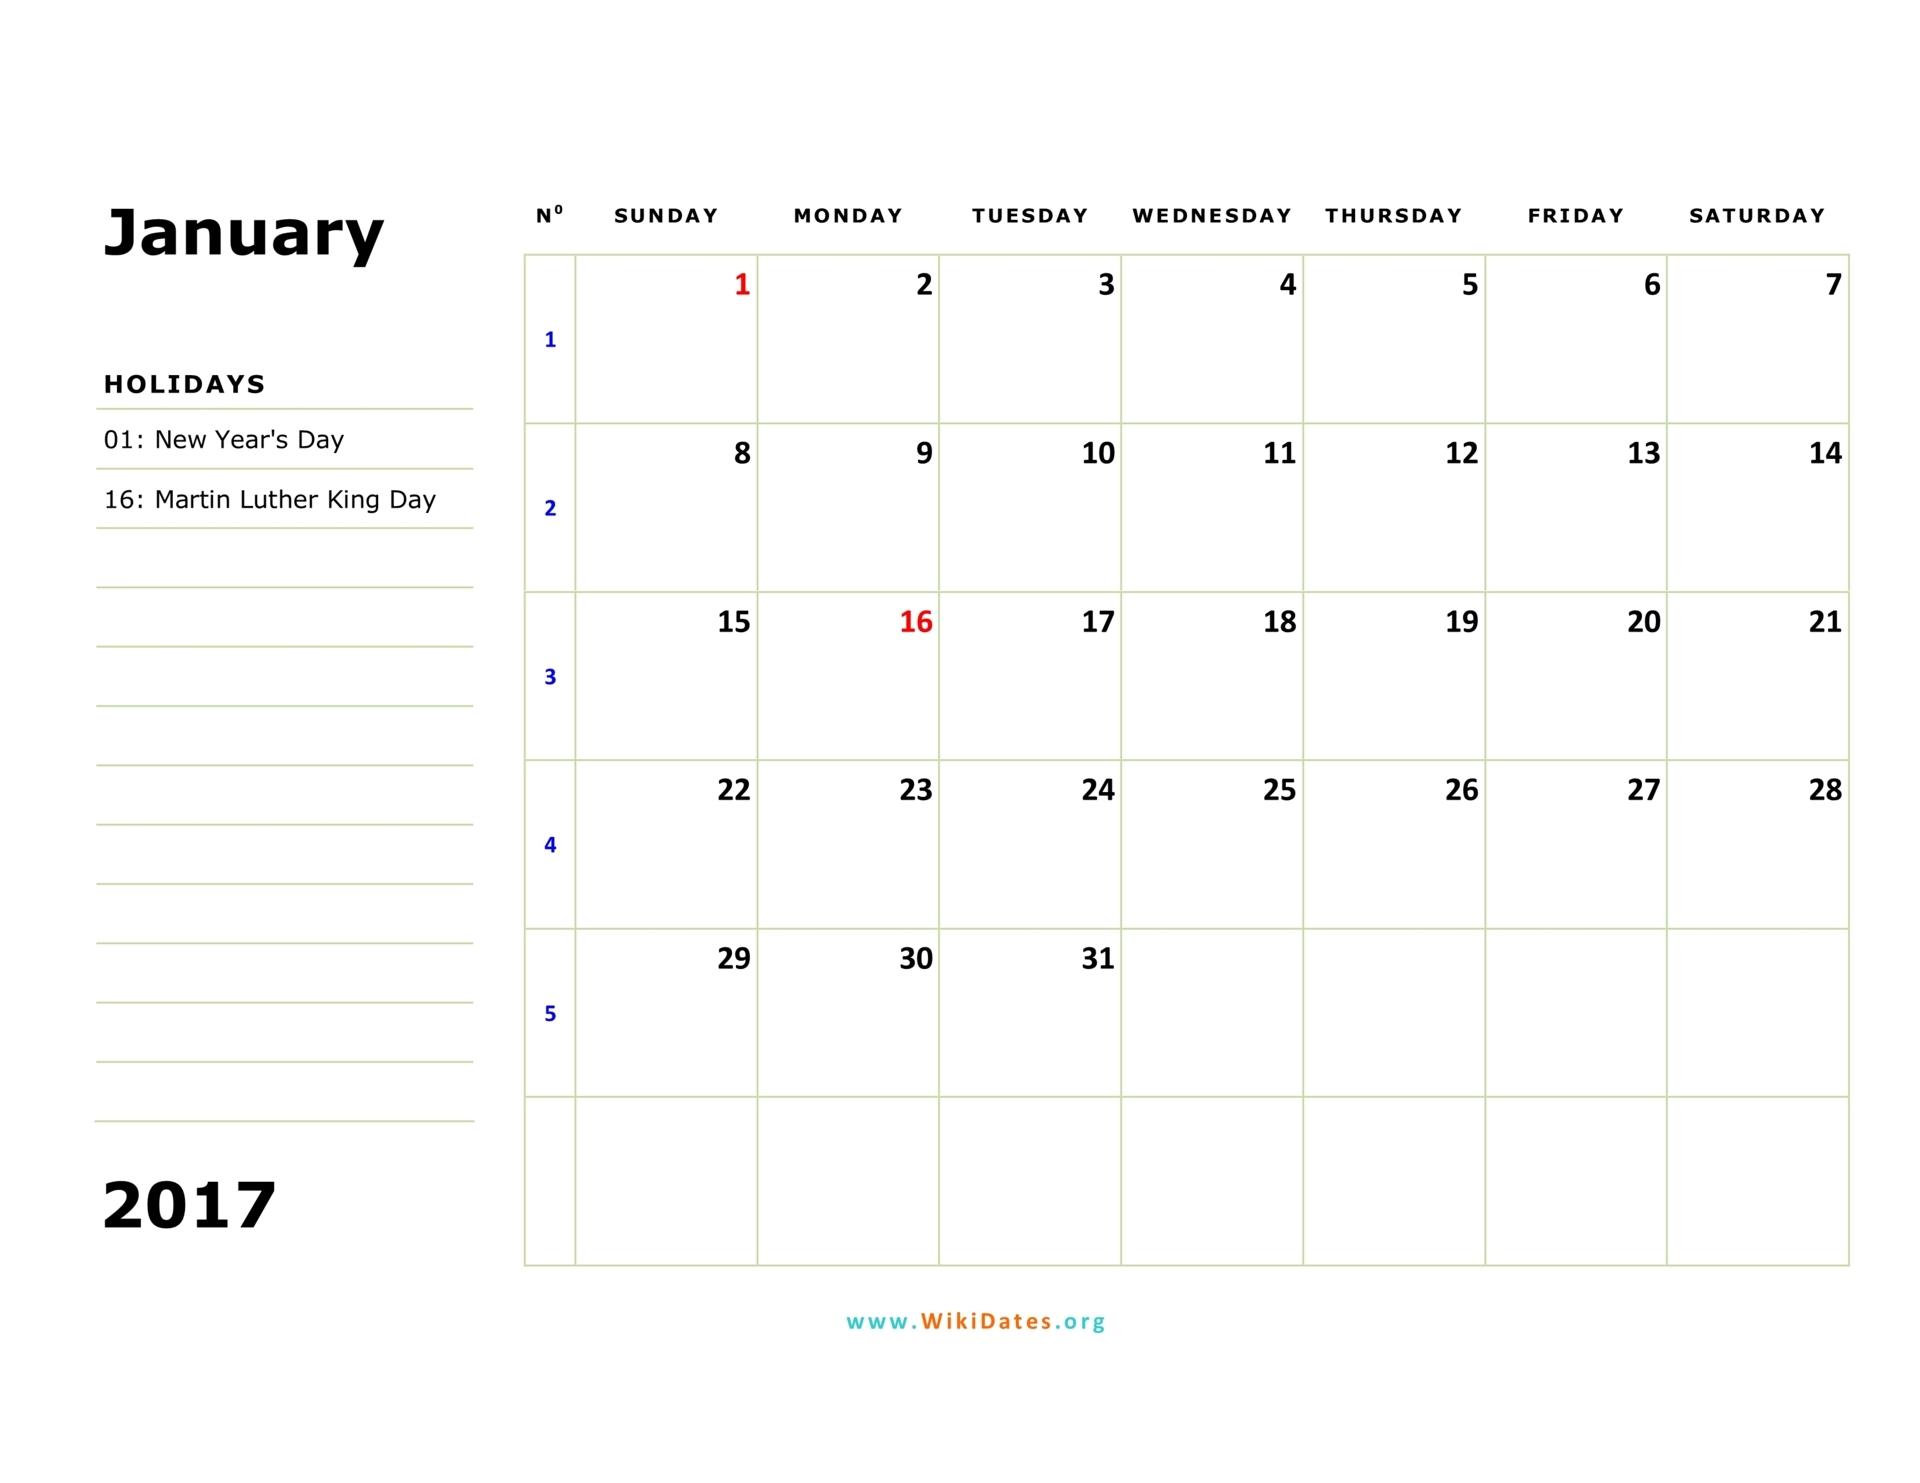 January 2017 Calendar   WikiDates.org